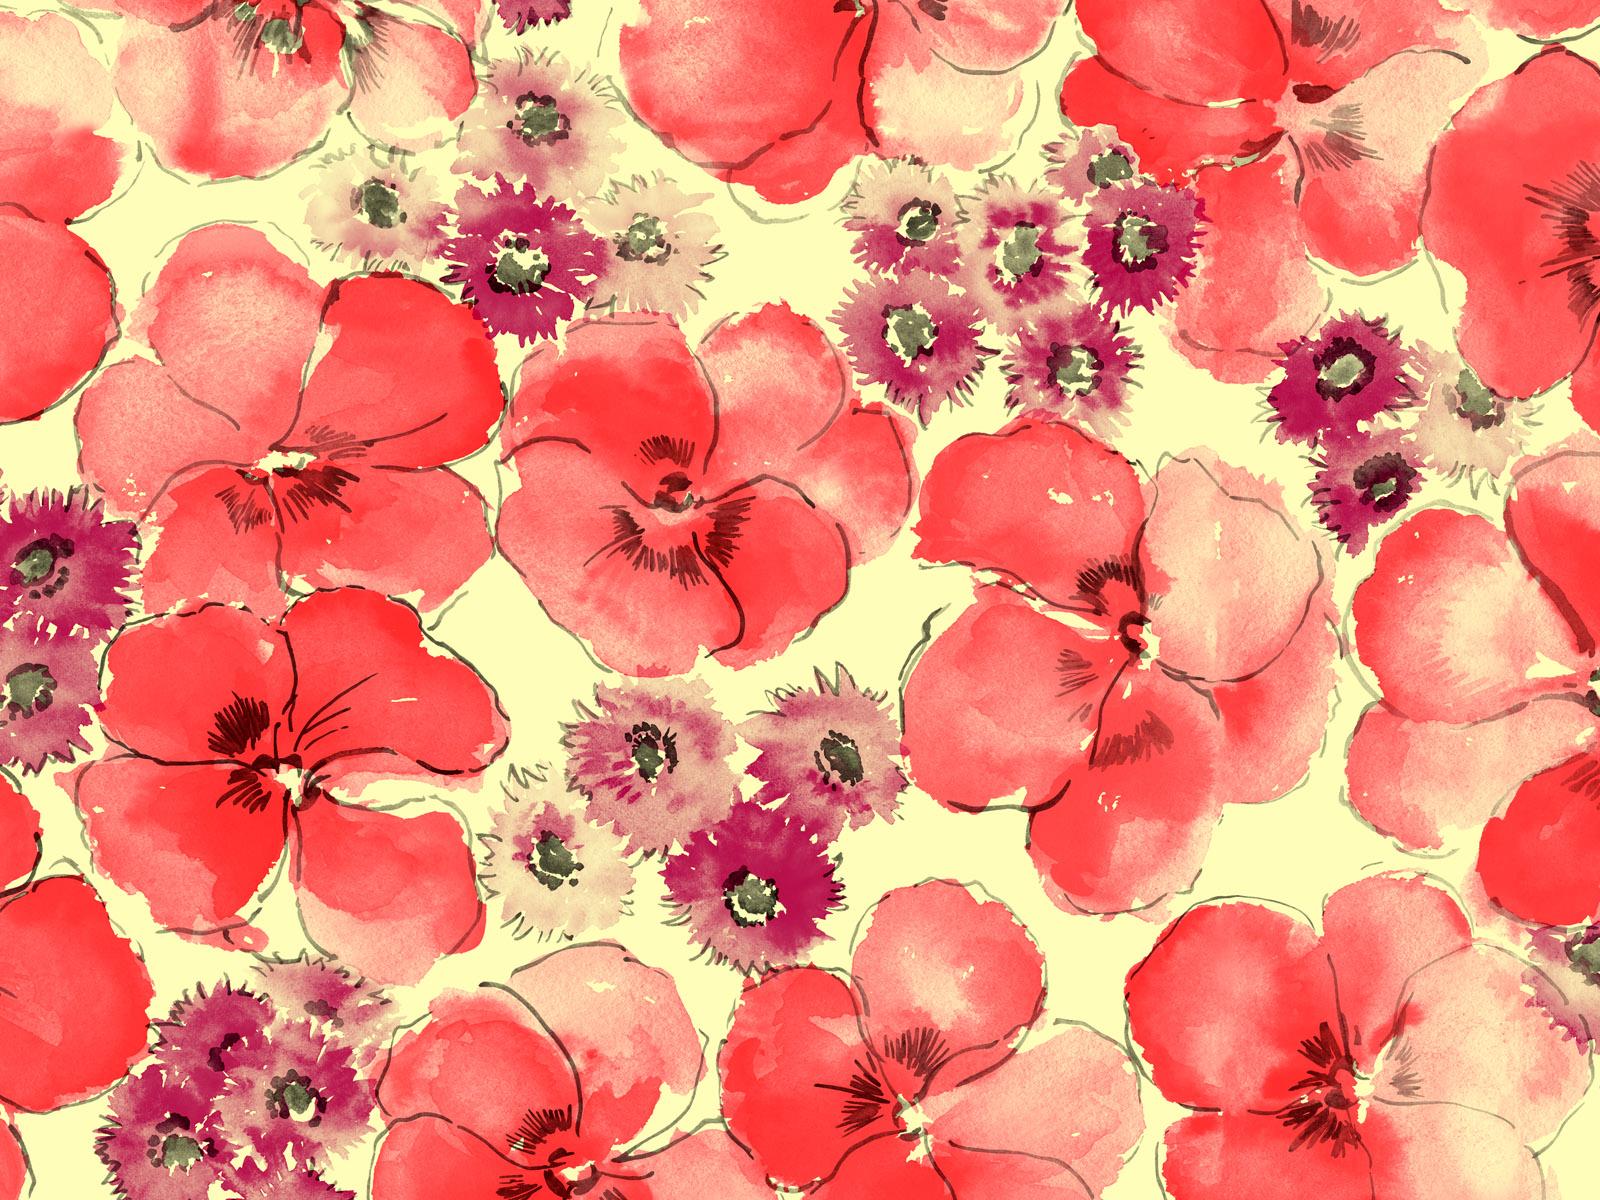 Цветы фон 1600 x 1200